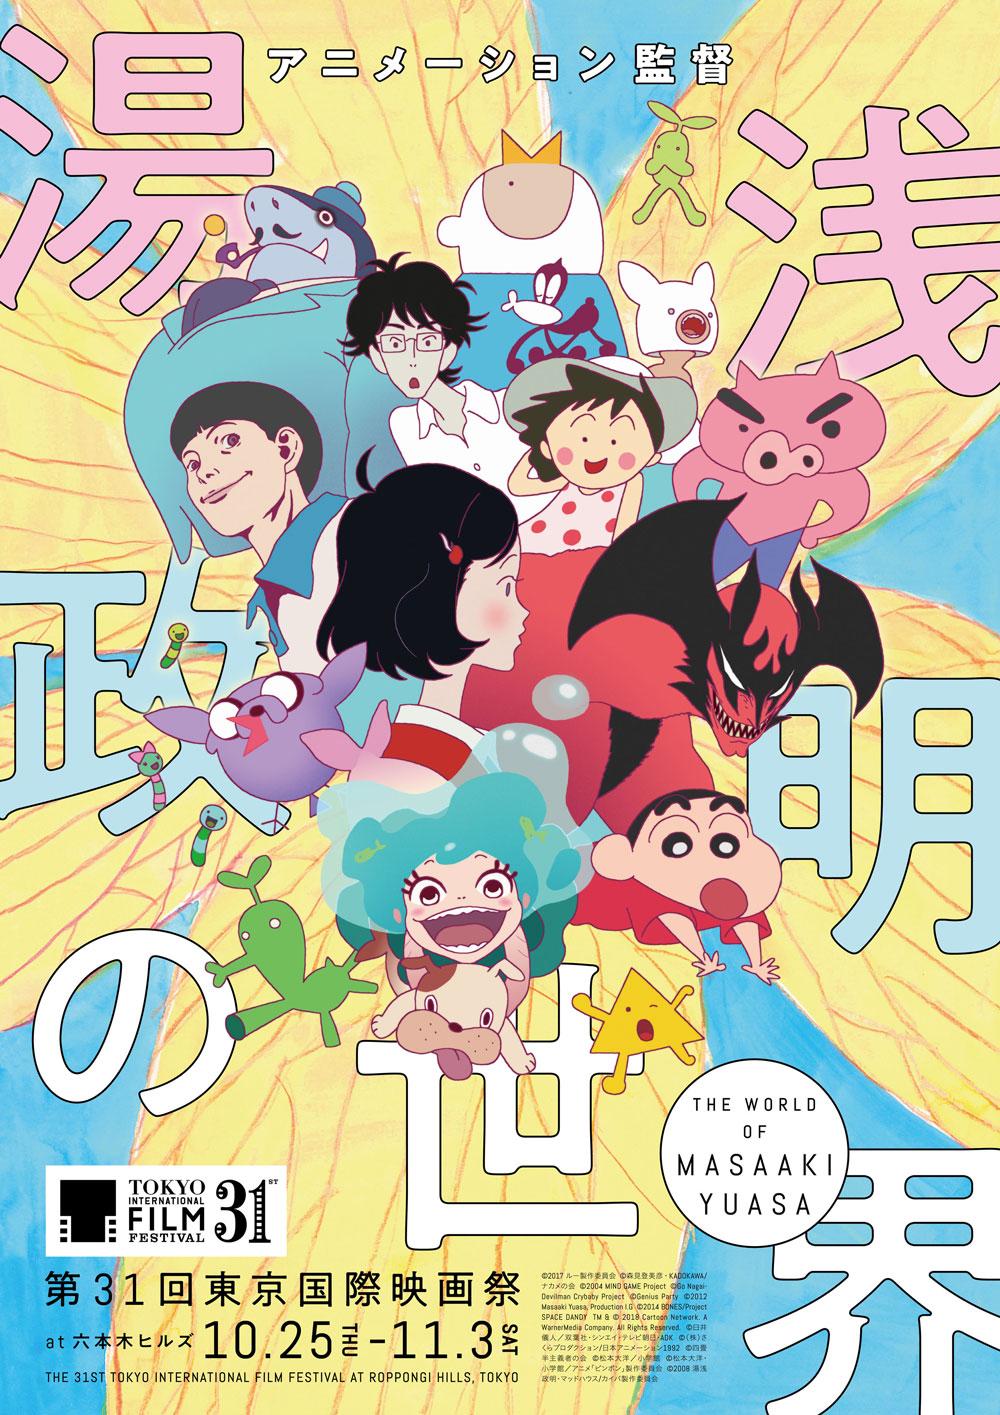 Masaaki Yuasa poster.